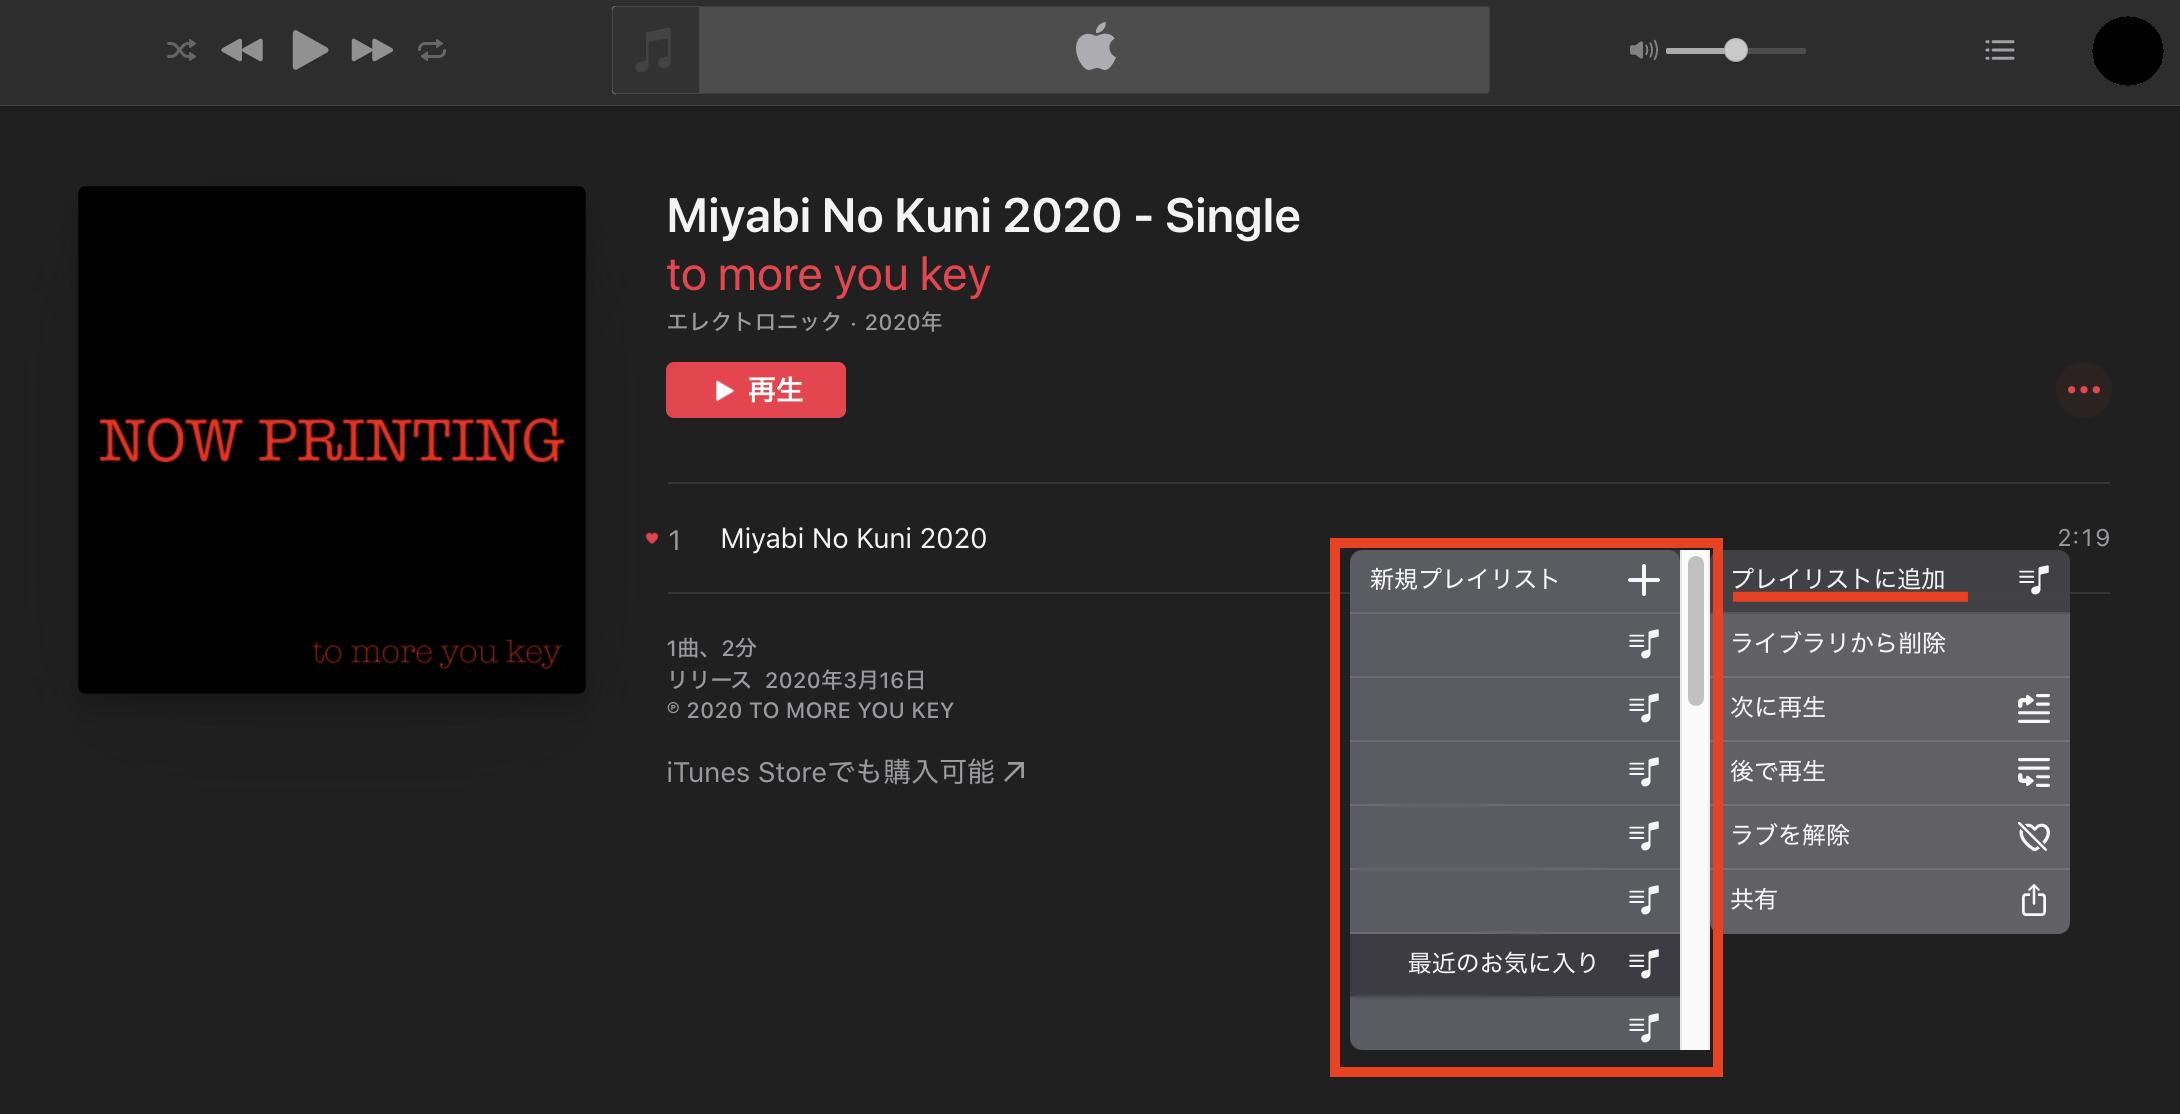 PC版 - AppleMusic & iTunes Music プレイリストへの楽曲追加方法|画像2